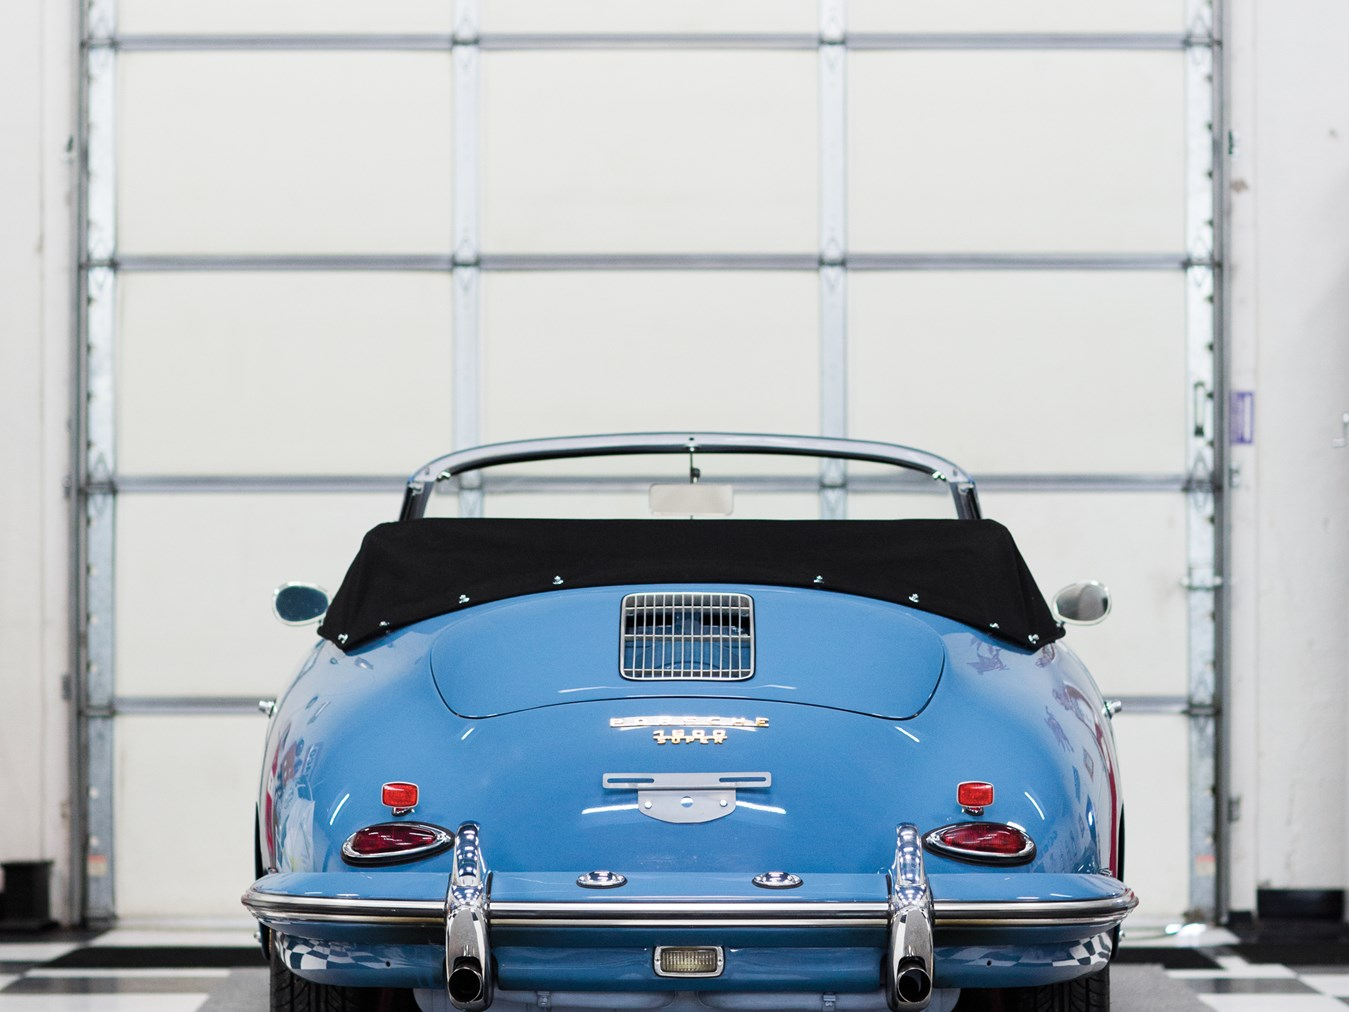 1961 porsche 356 b 1600 super cabriolet by reutter